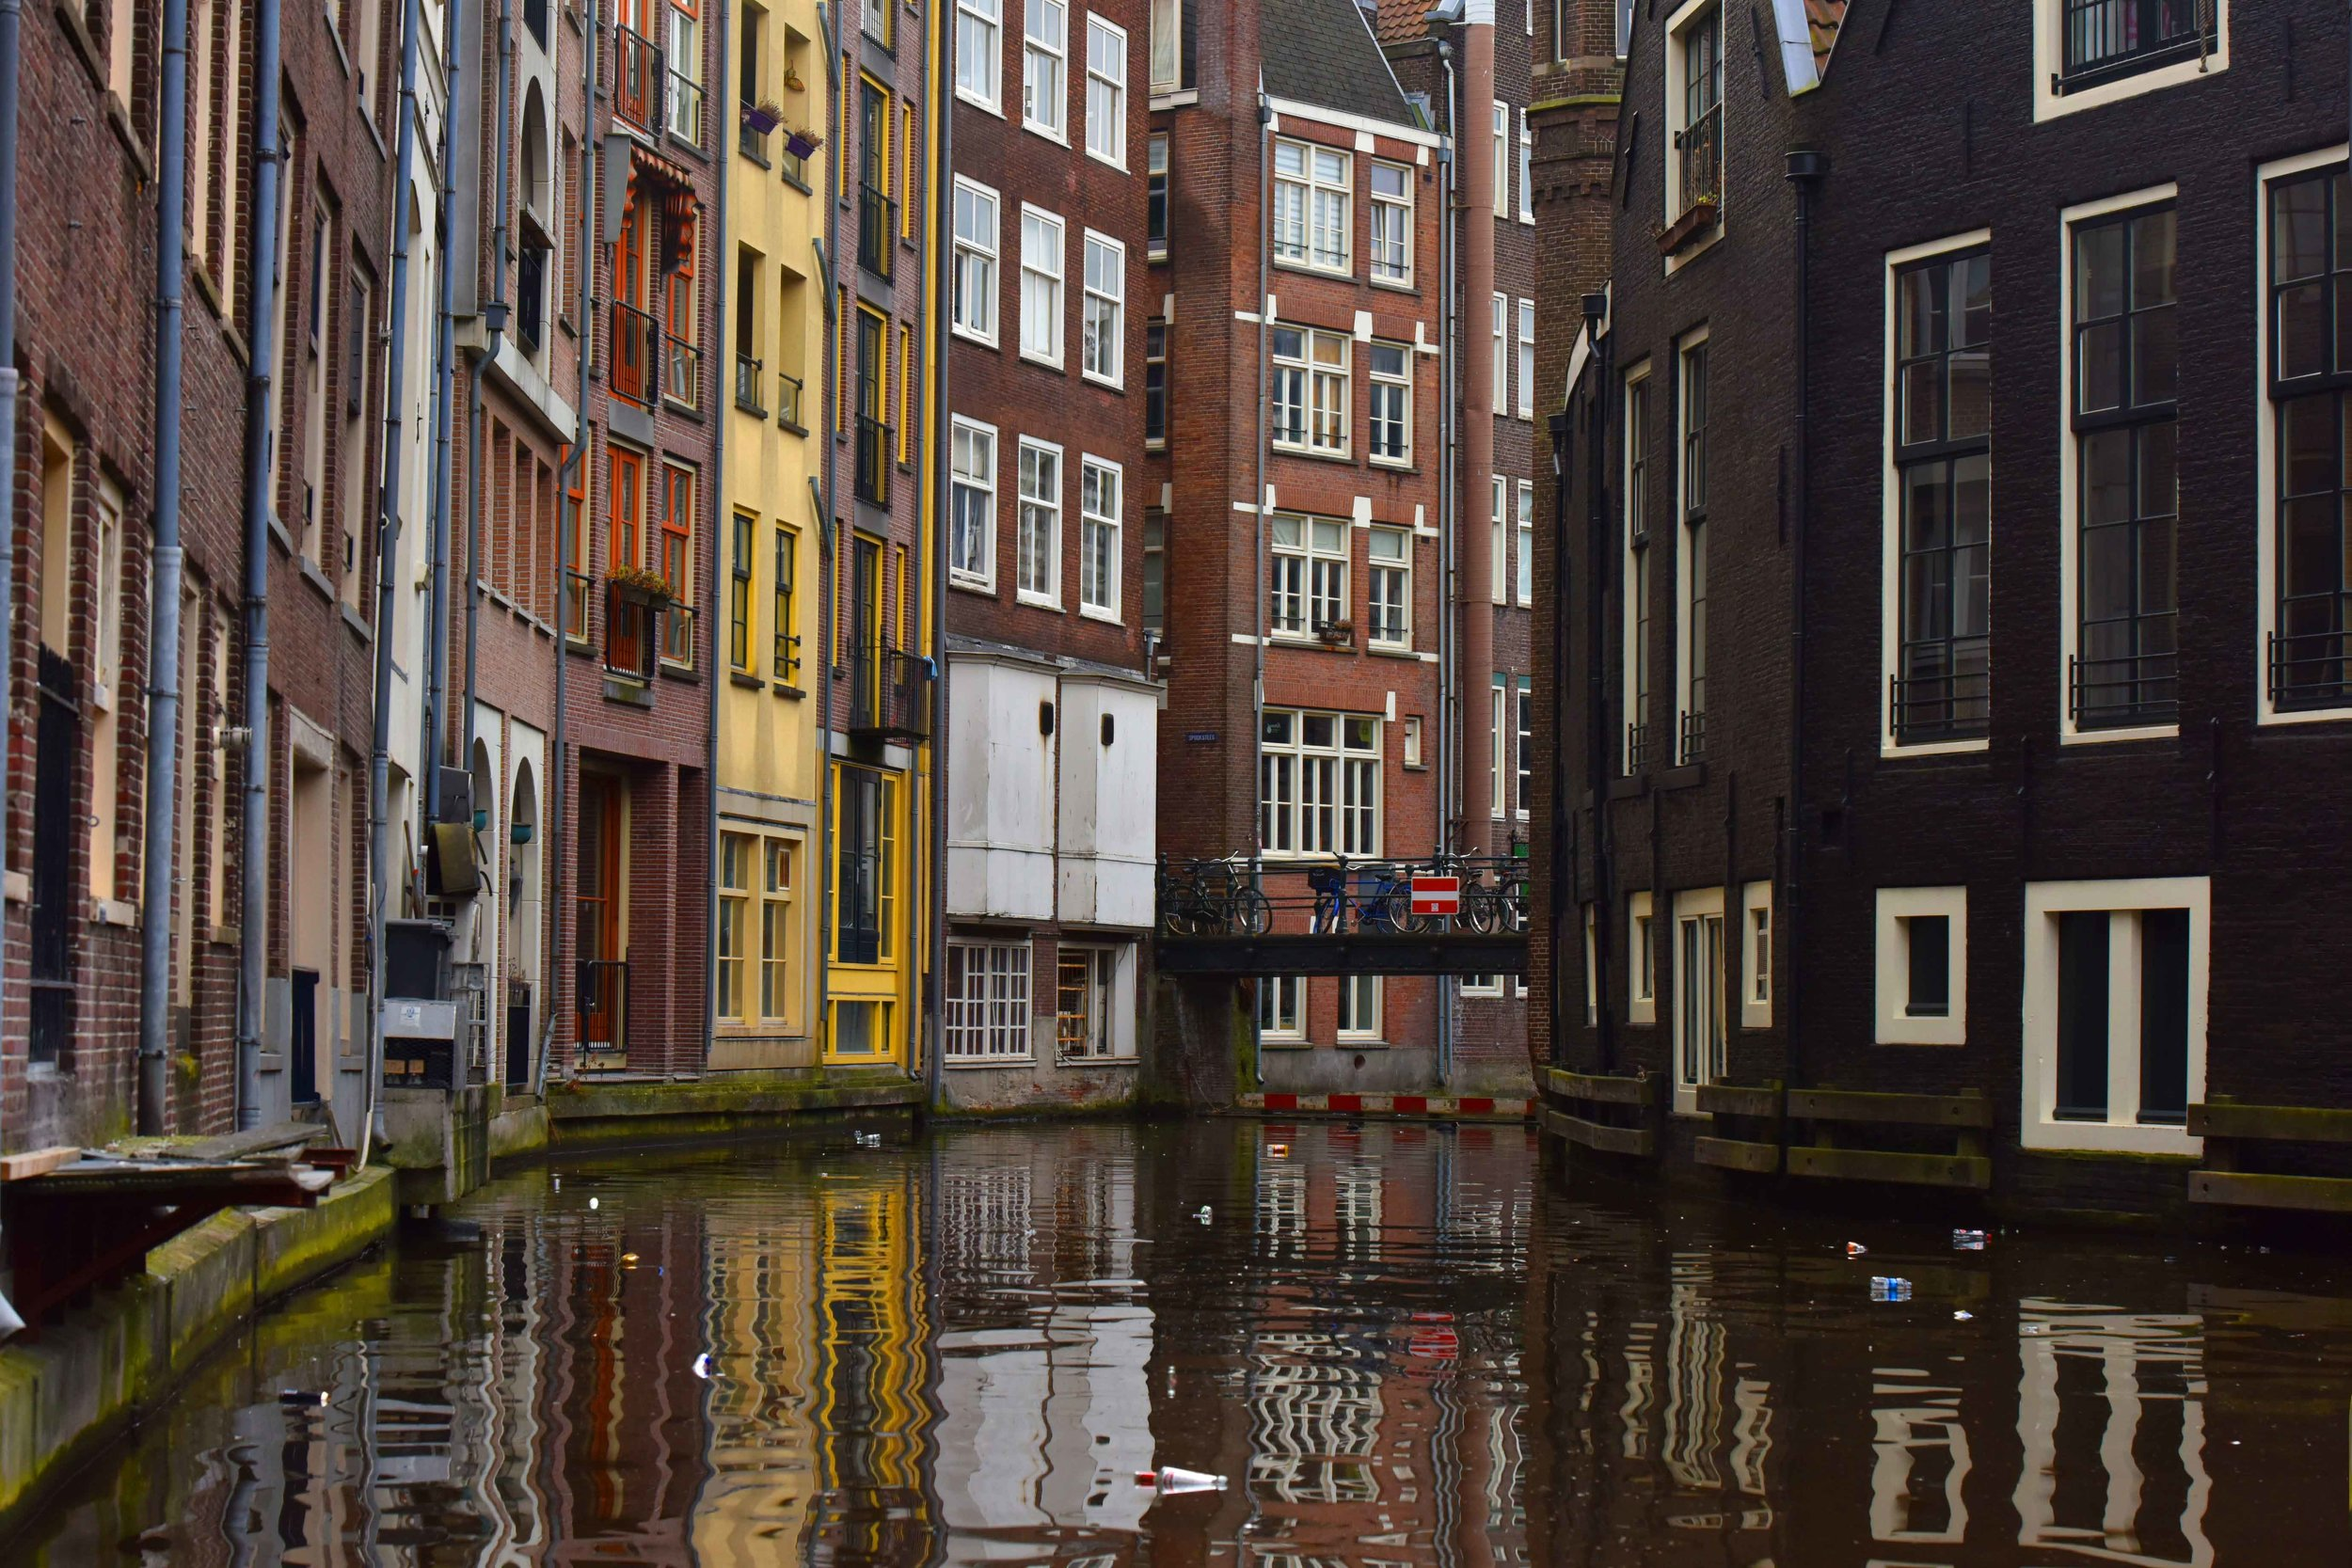 Amsterdam, Venice of the North. Image©thingstodot.com